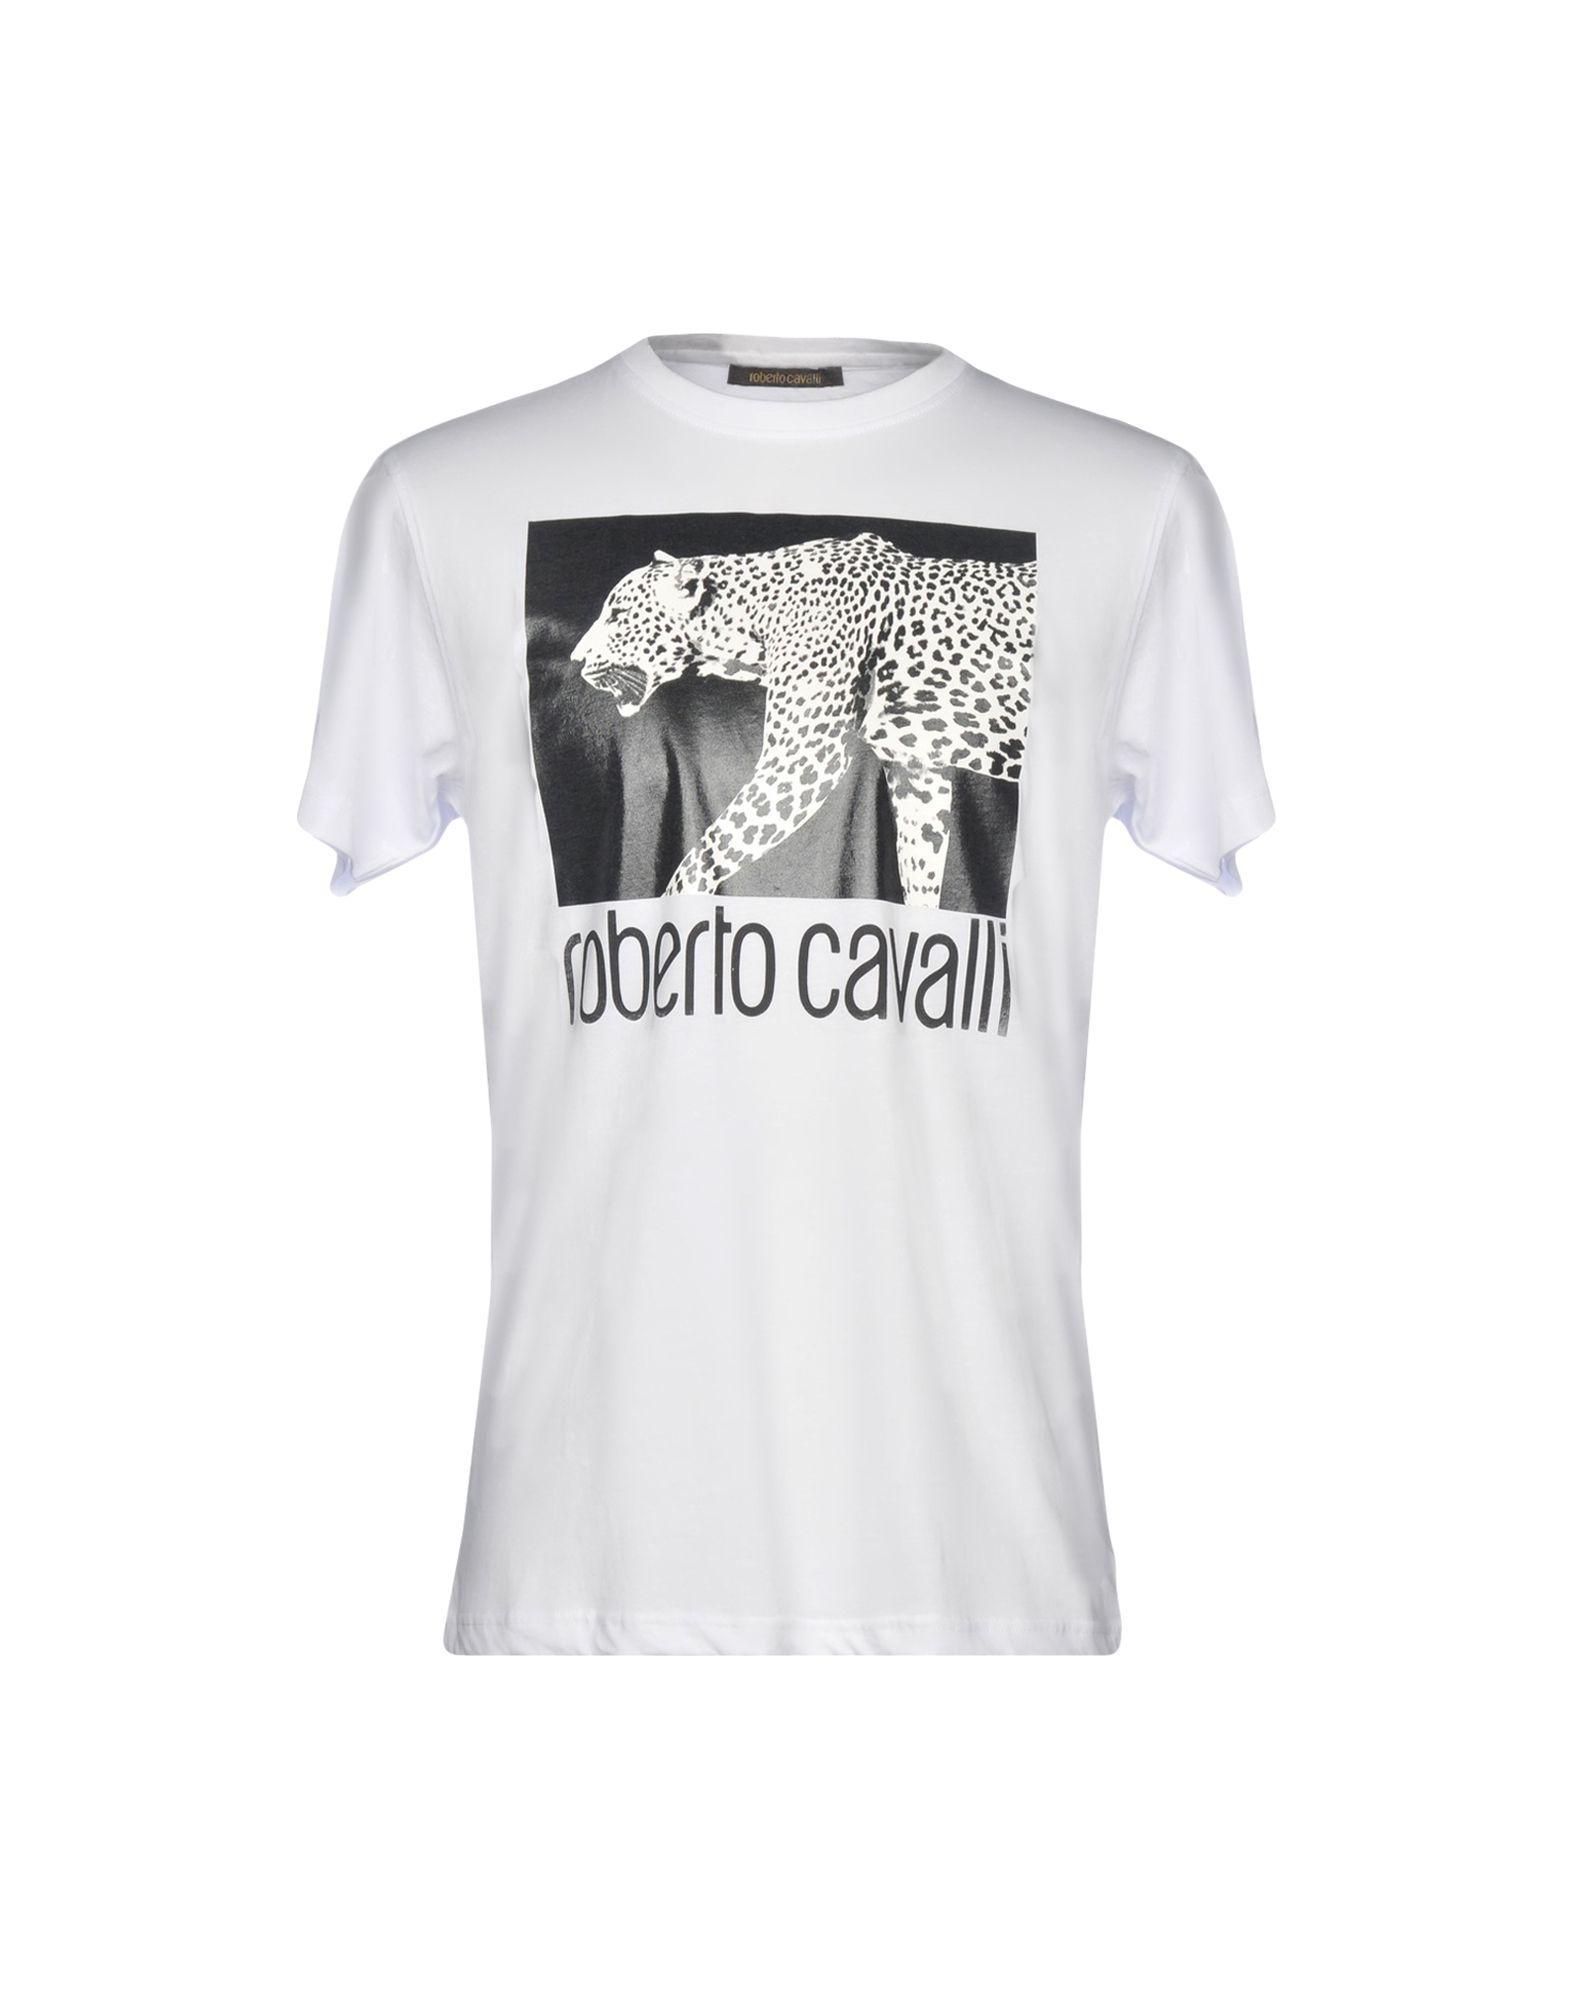 a4e23a5b6 Lyst - Roberto Cavalli T-shirt in White for Men